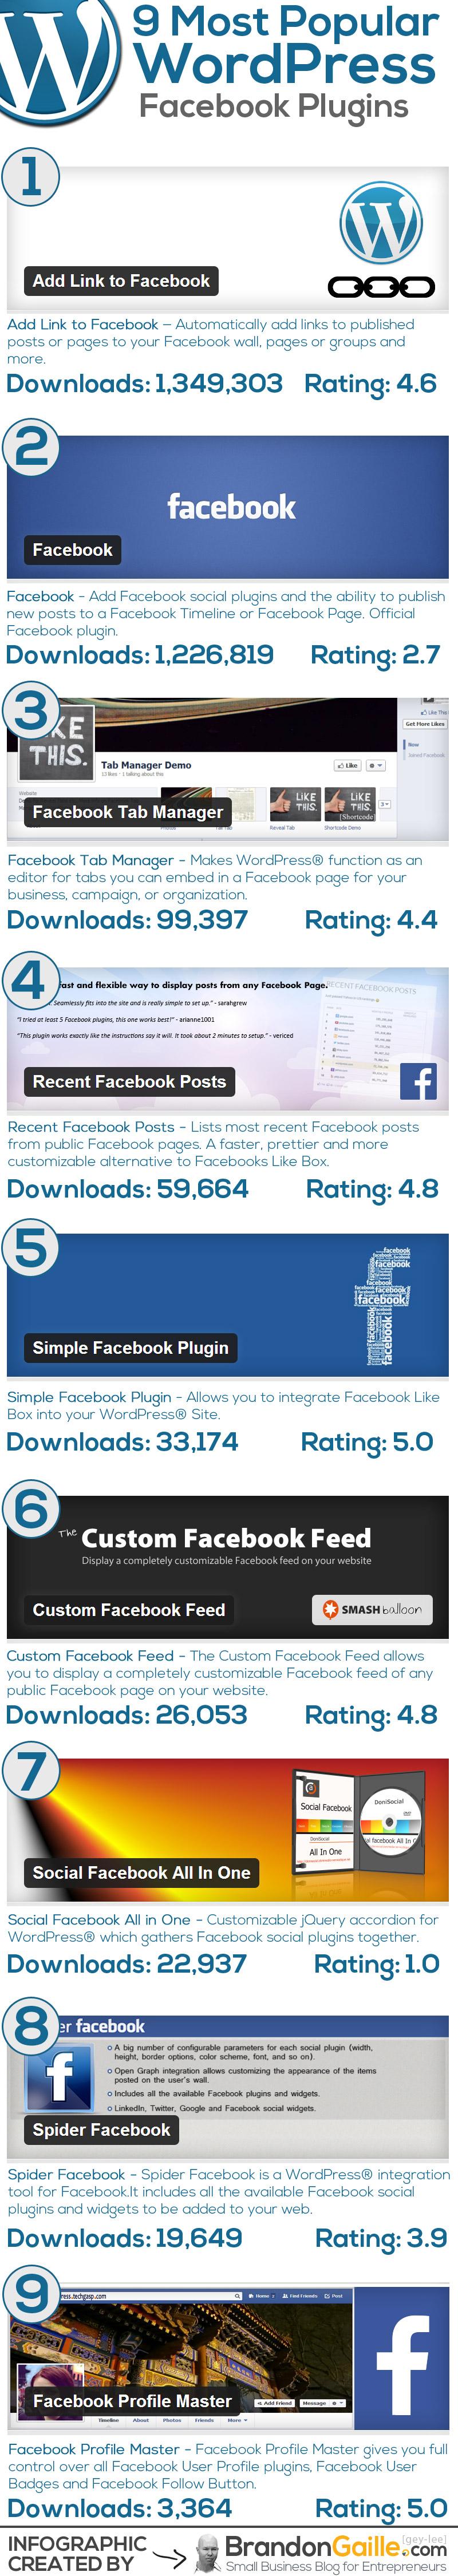 Best-Wordpress-Facebook-Plugins-Infographic